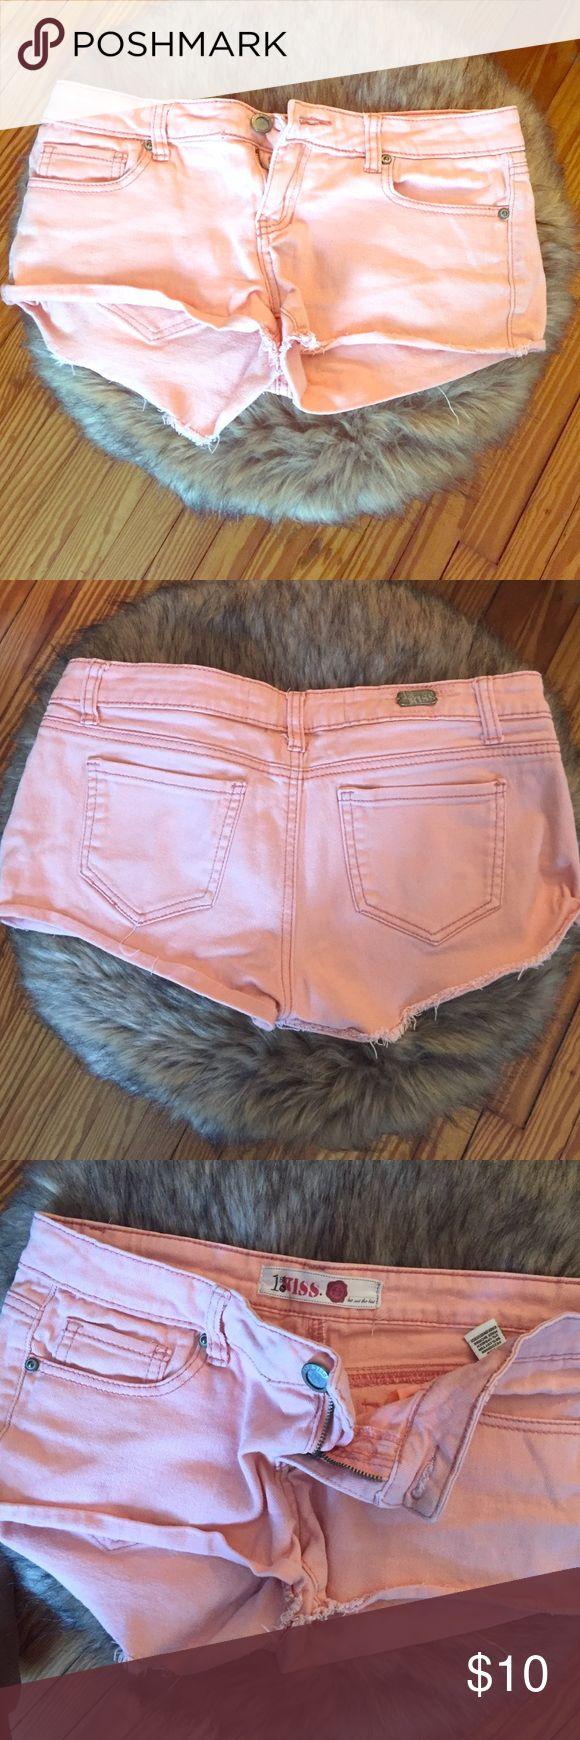 Peach Jeans Shorts 1st Kiss Peach Jean shorts. Low rise. Some stretch. Size 6 1st Kiss Shorts Jean Shorts